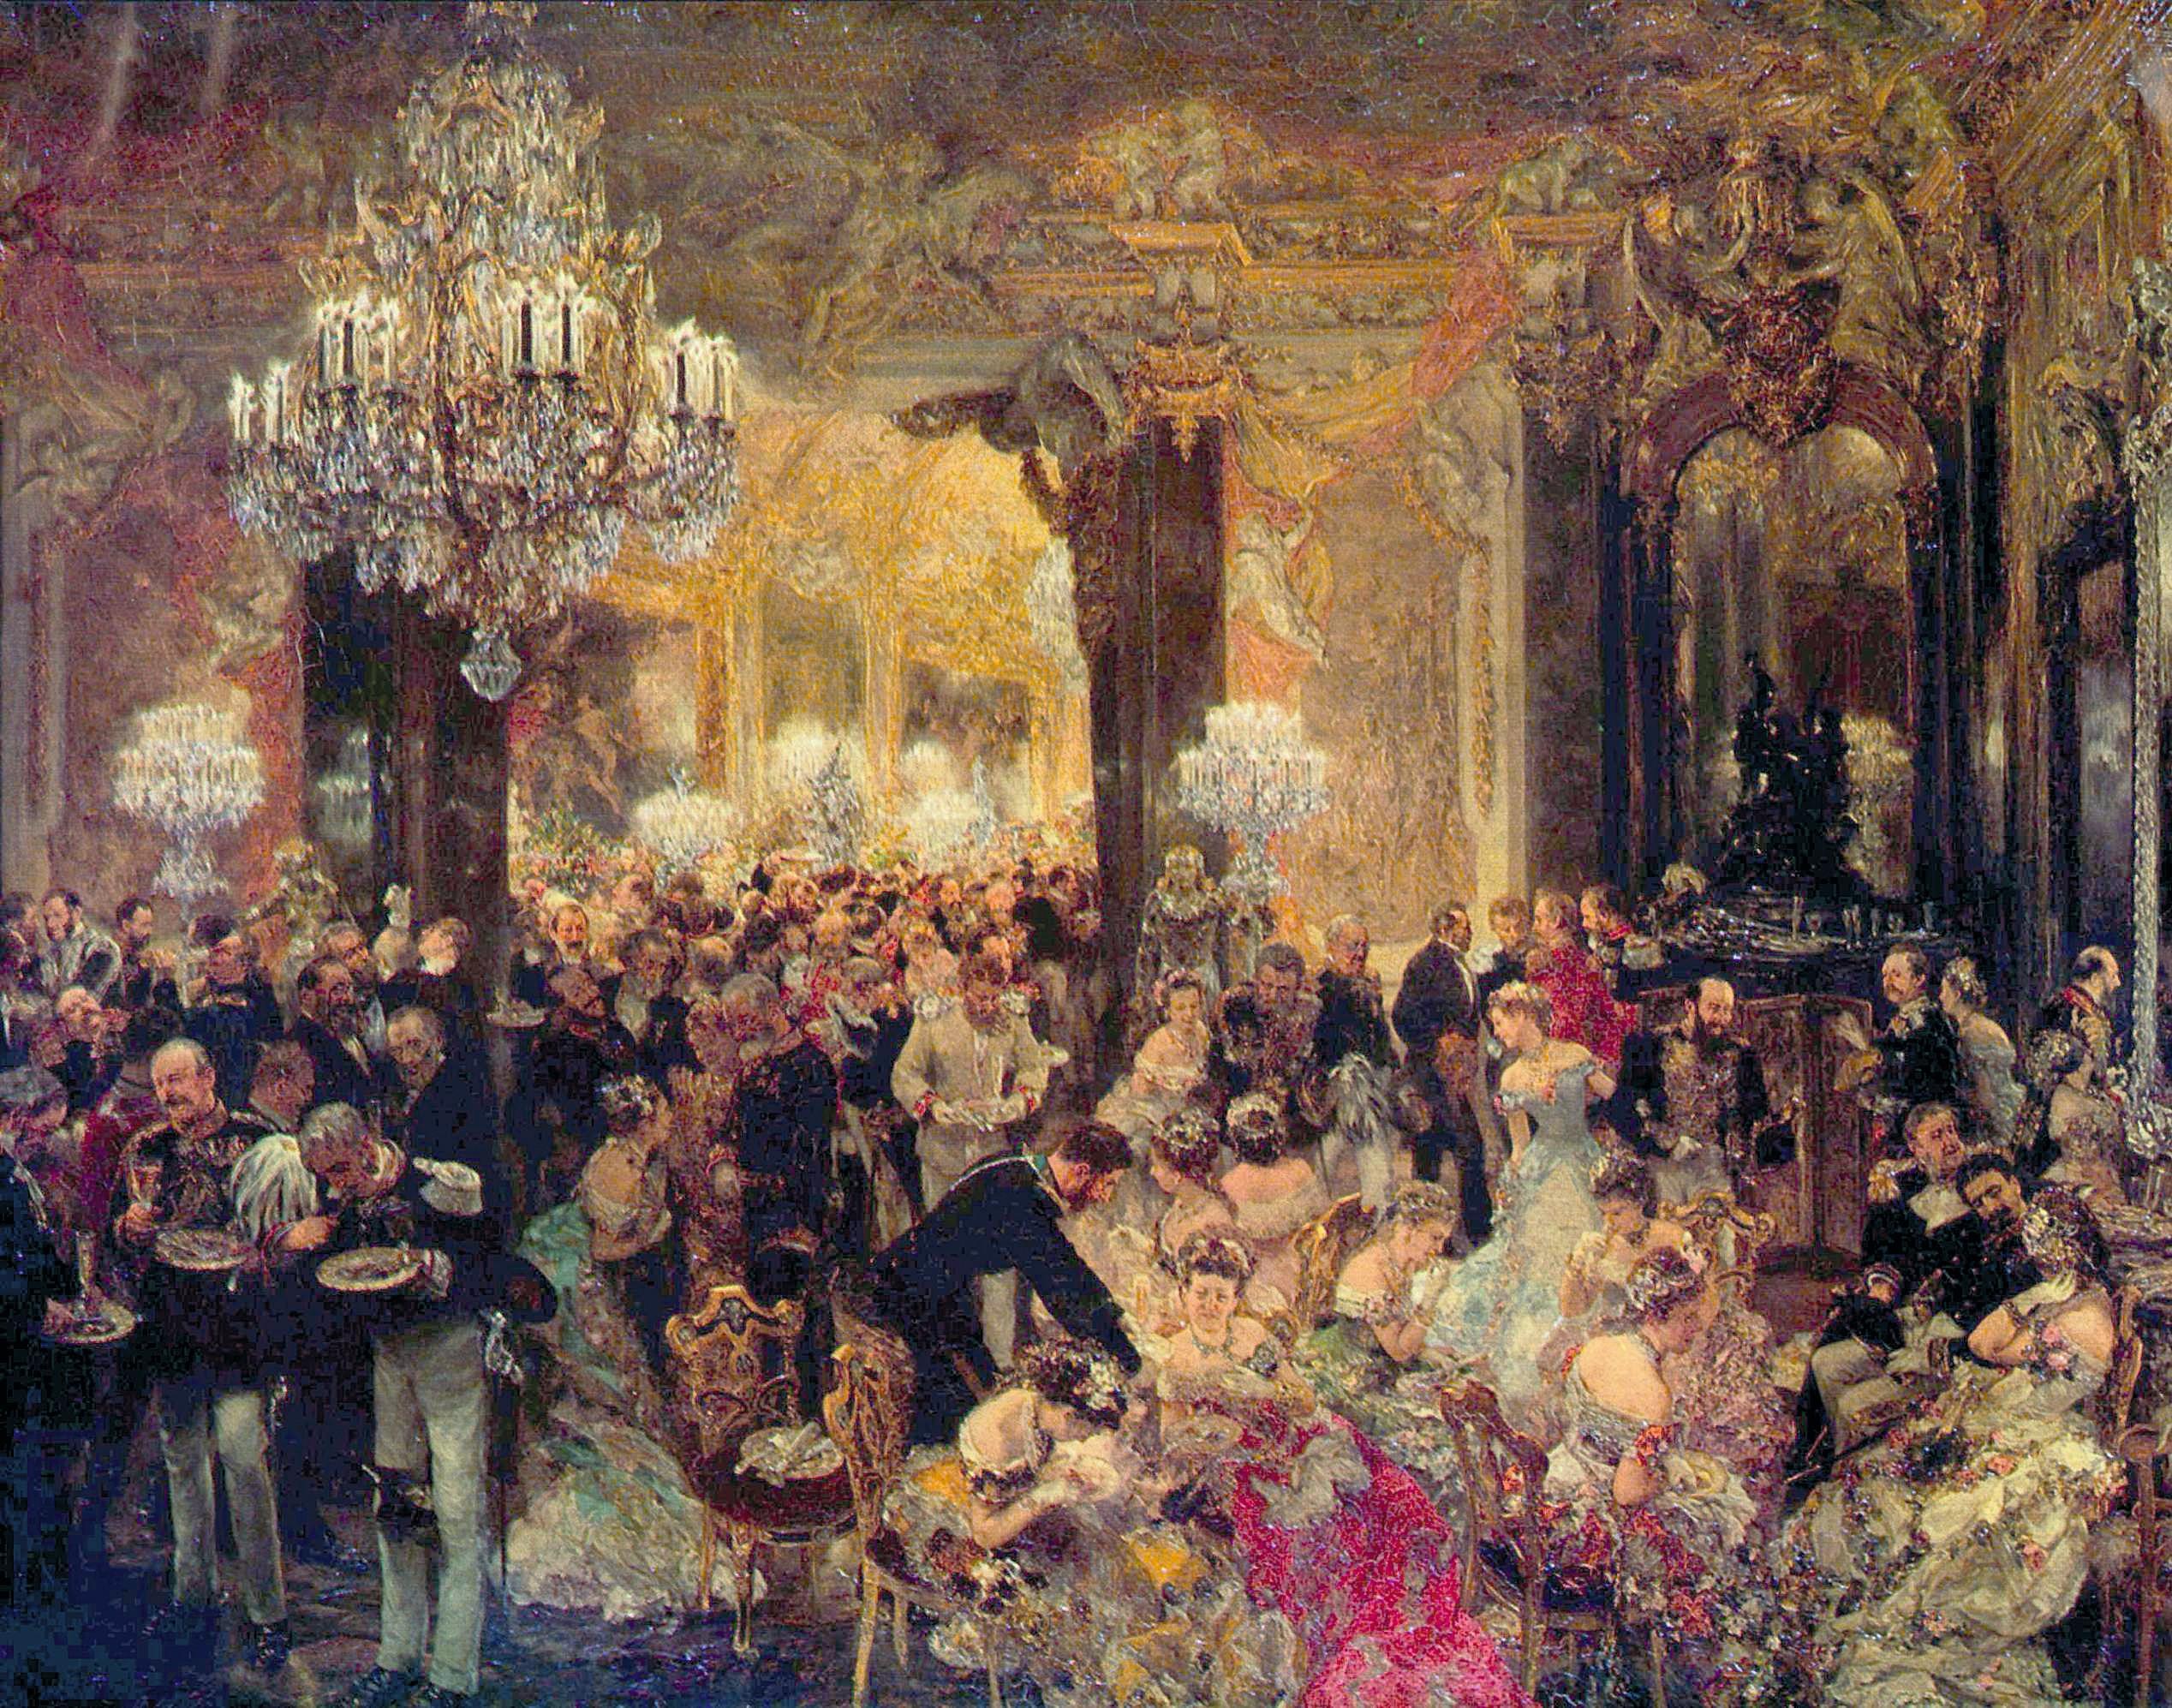 Adolph von Menzel, Dîner de bal, huile sur toile, 71 × 90 cm, Alte Nationalgalerie, Berlin, 1878.